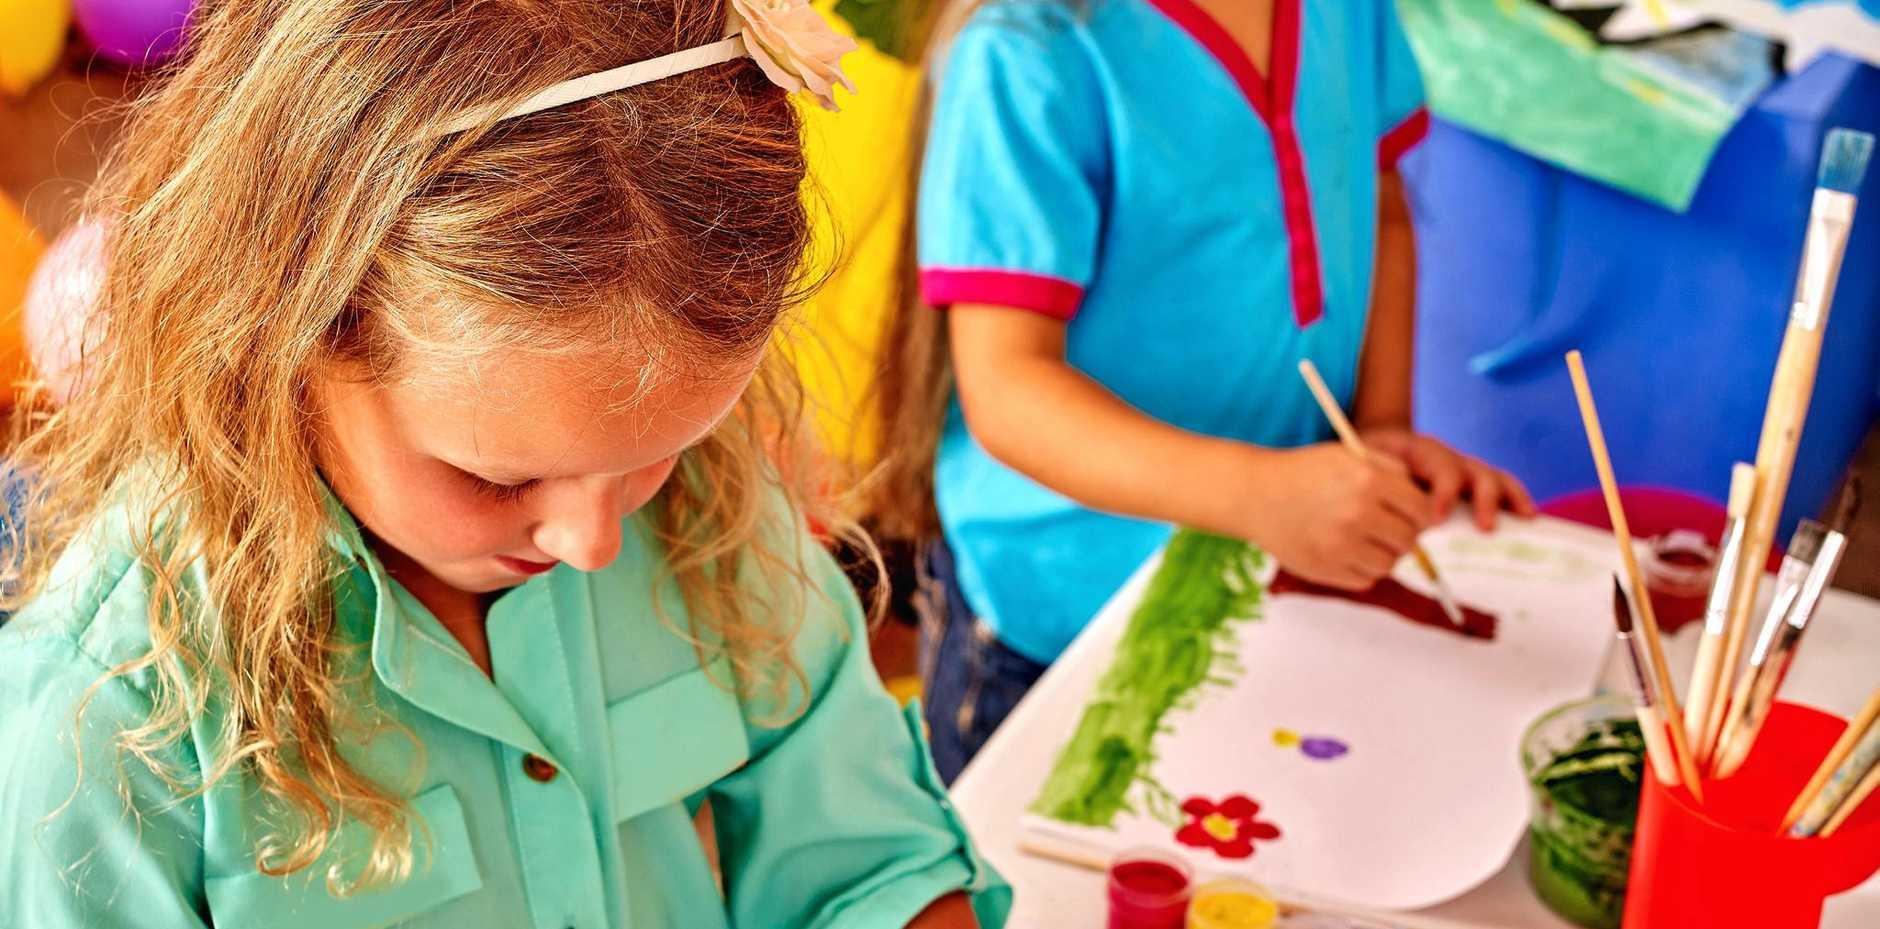 CREATIVE MINDS: Get crafty at Spotlight Bundaberg's free workshops next month.